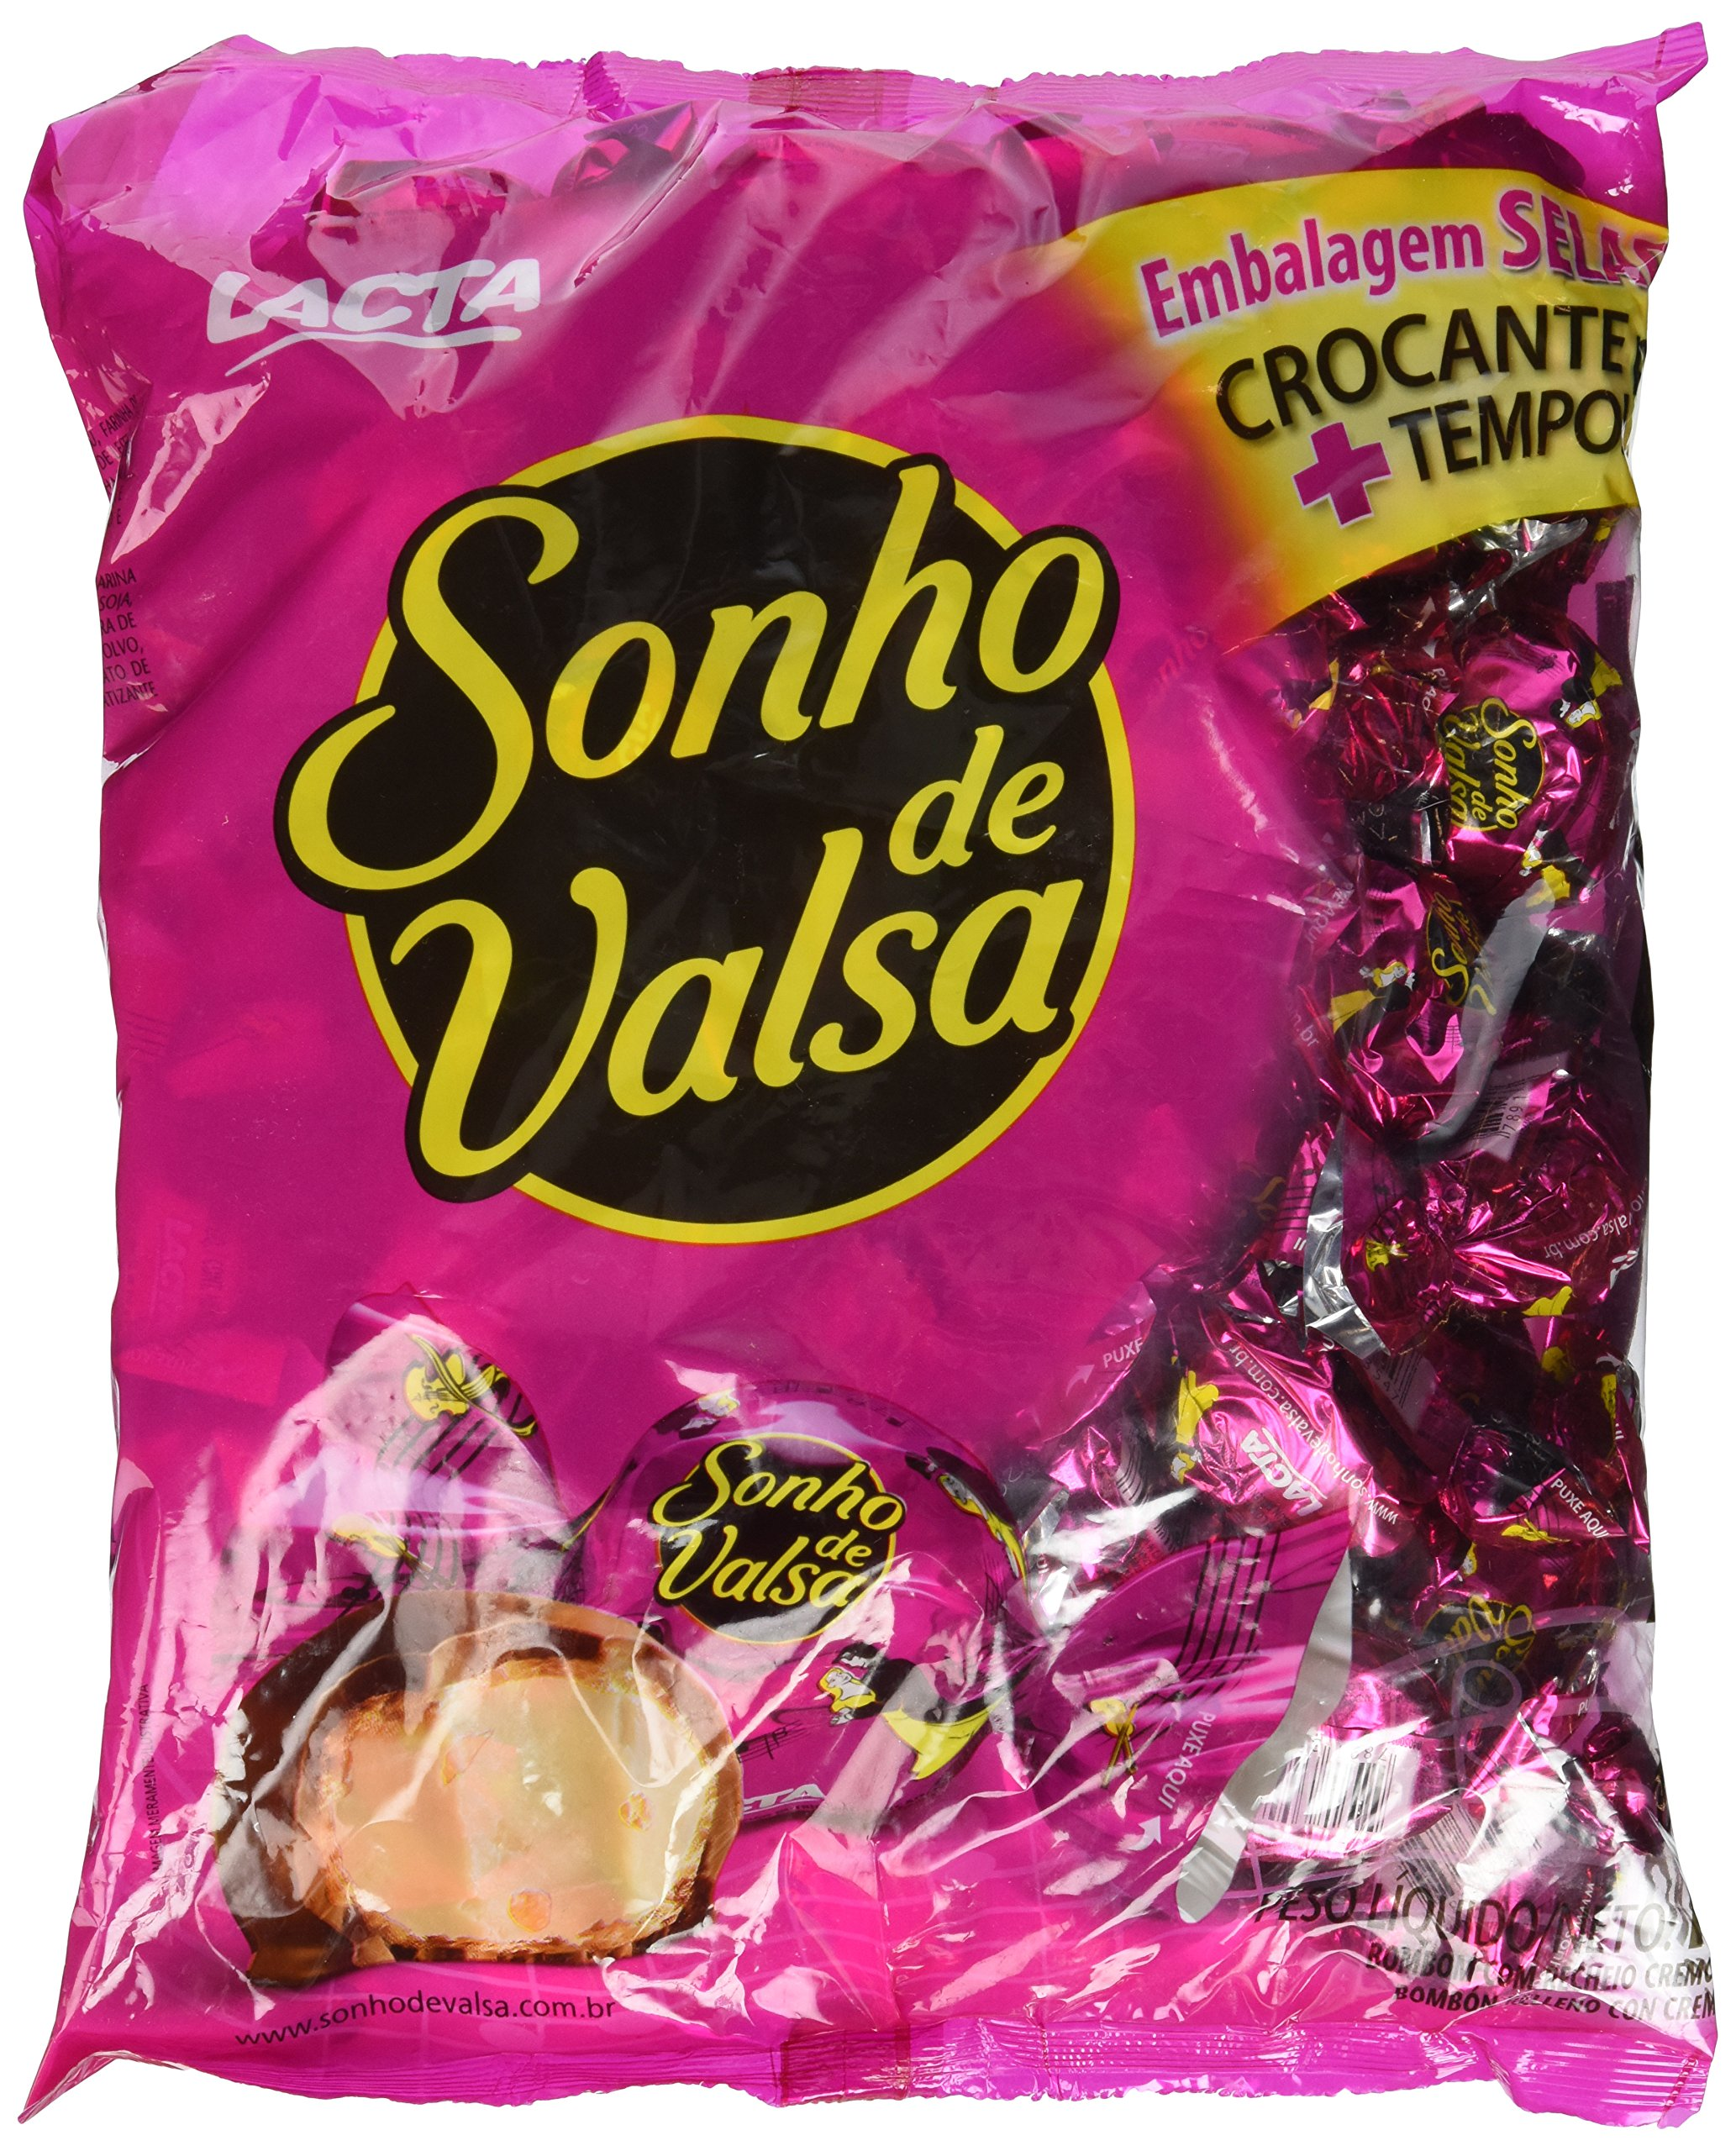 Bonbon Sonho De Valsa - Lacta - 35.27oz   Bombom Sonho De Valsa Lacta - 1kg